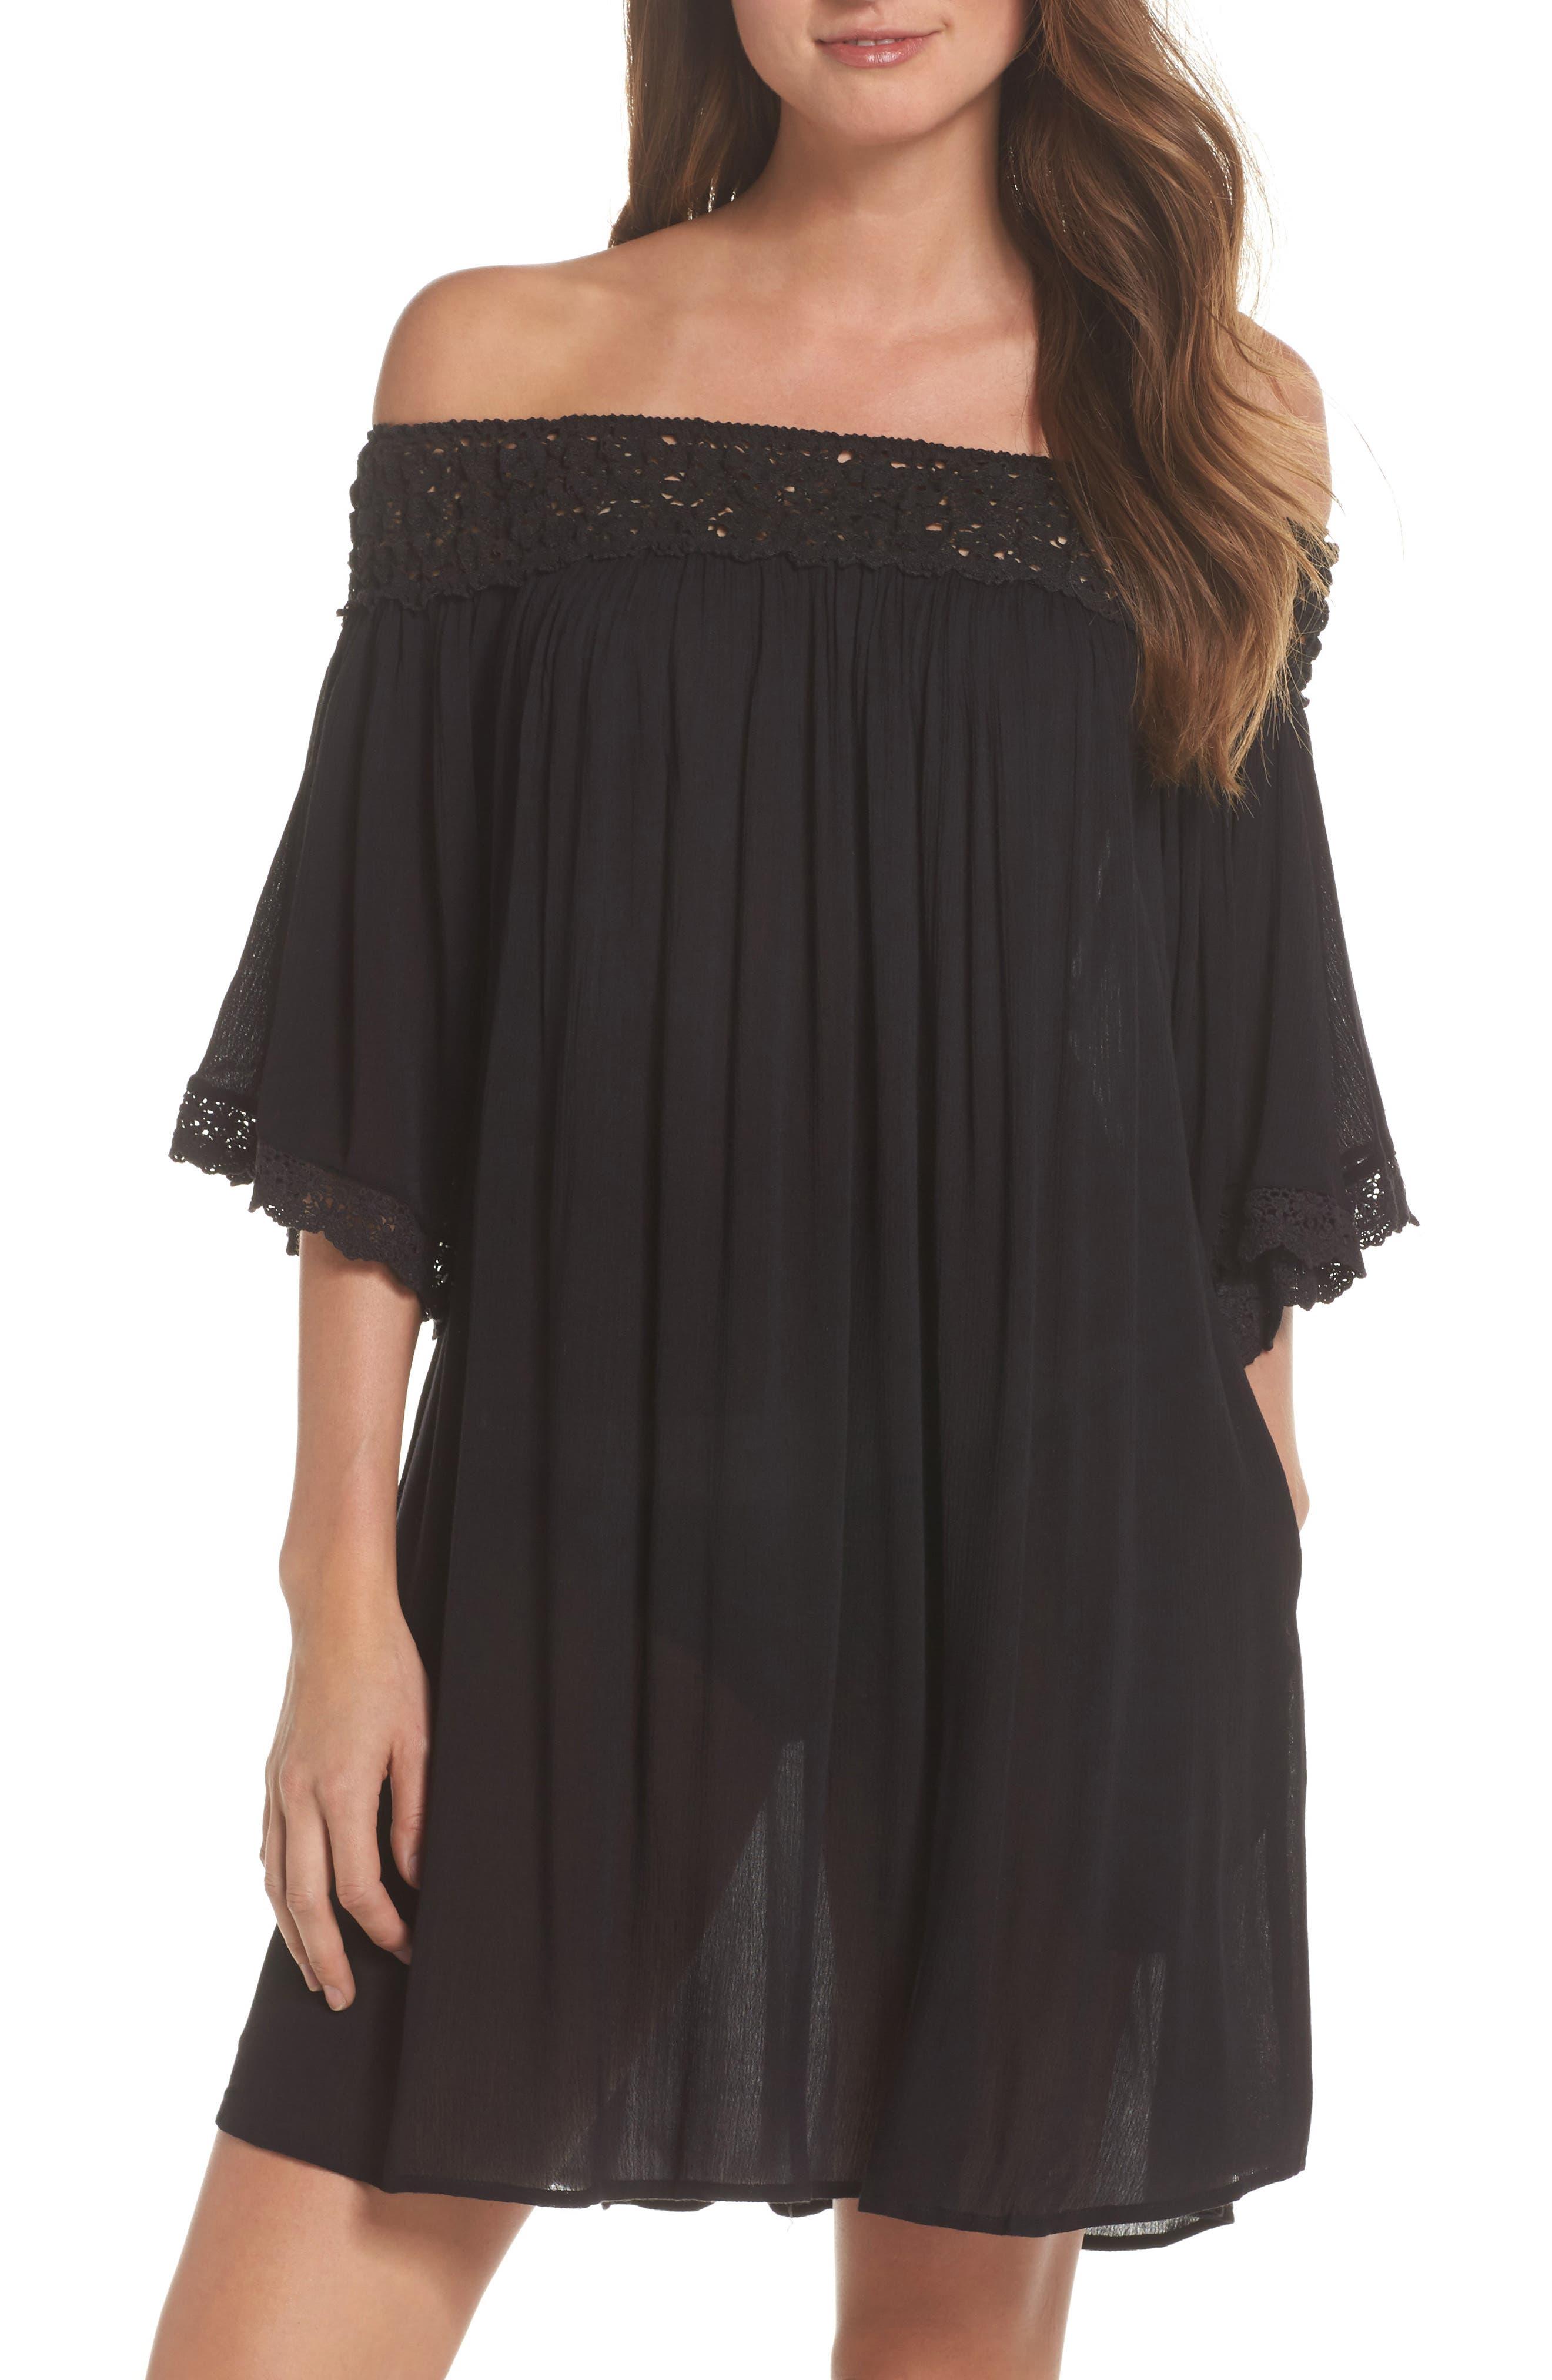 Rimini Crochet Cover-Up Dress,                         Main,                         color, Black